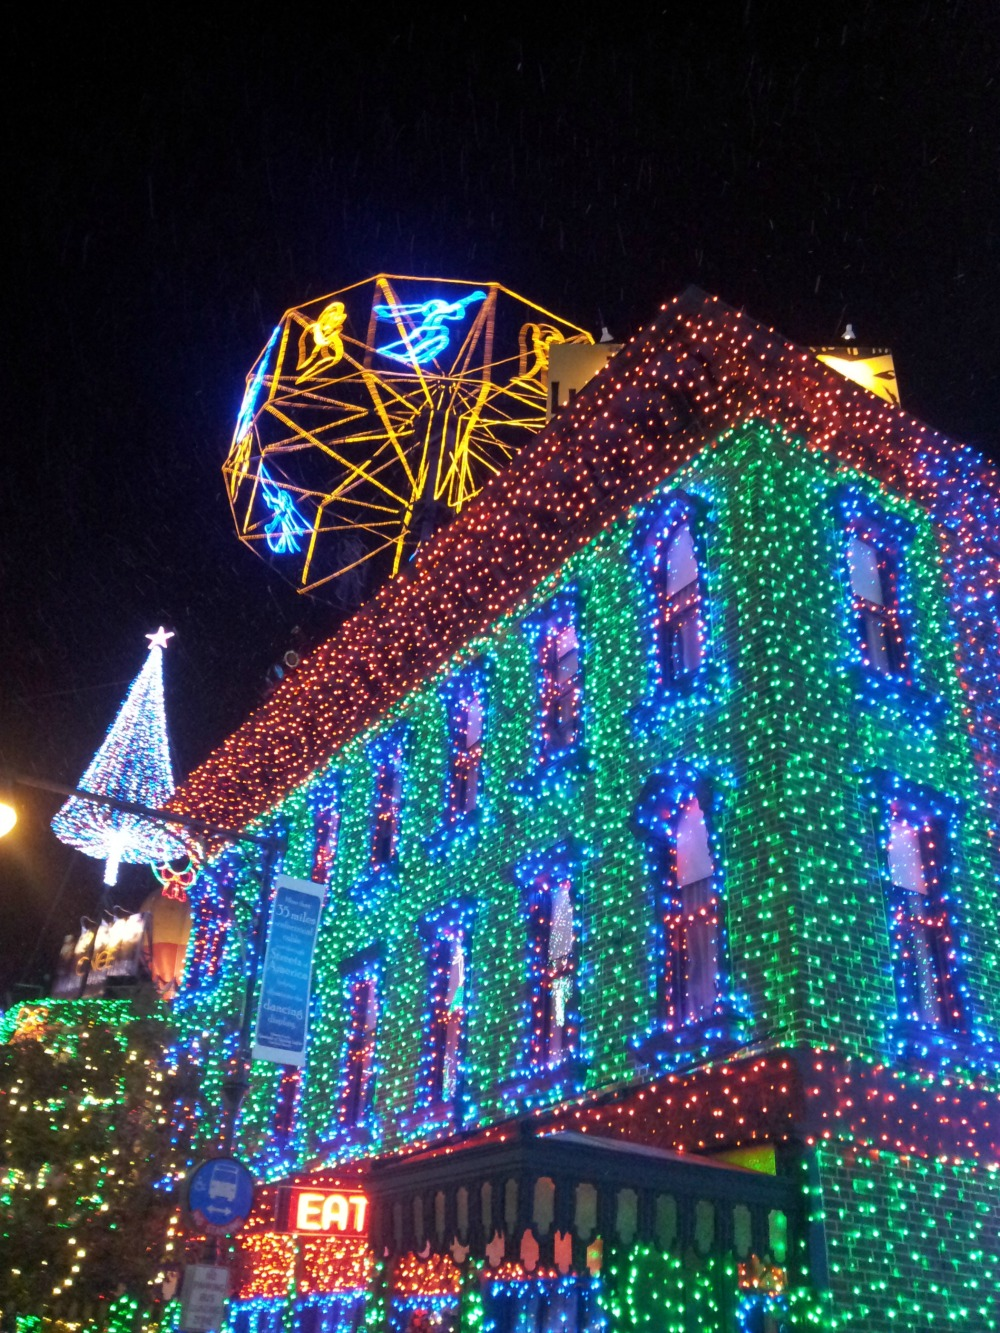 hotel savings on disney springs hotel through dec 31 2015 hollywood studios at - Disney Christmas 2015